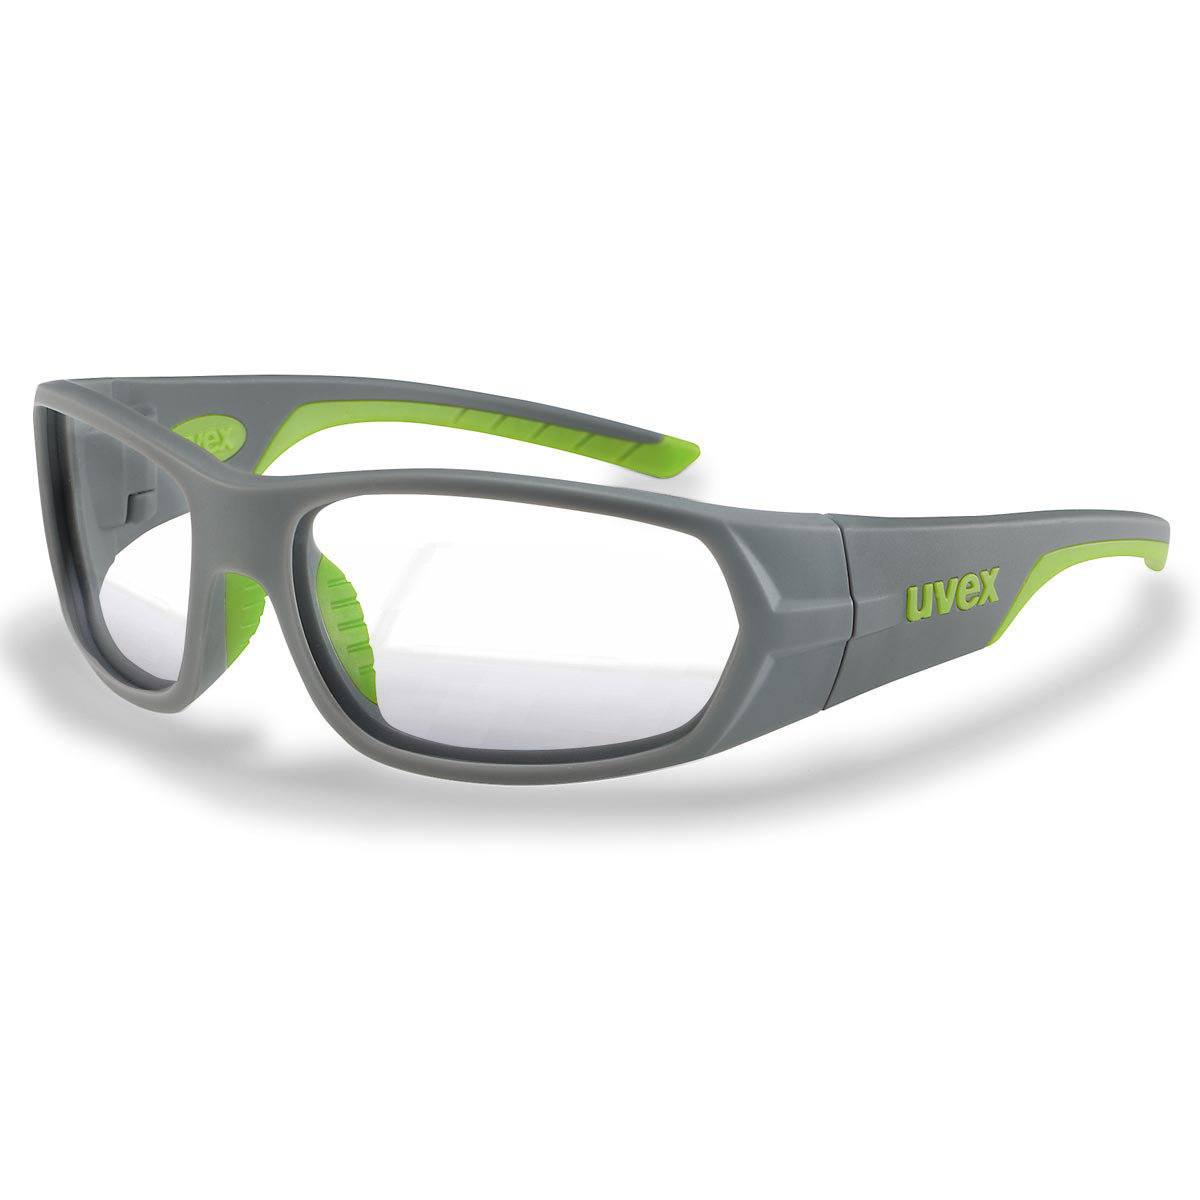 Uvex Korrektionsschutzbrille RX sp 5513 - UV blue protect